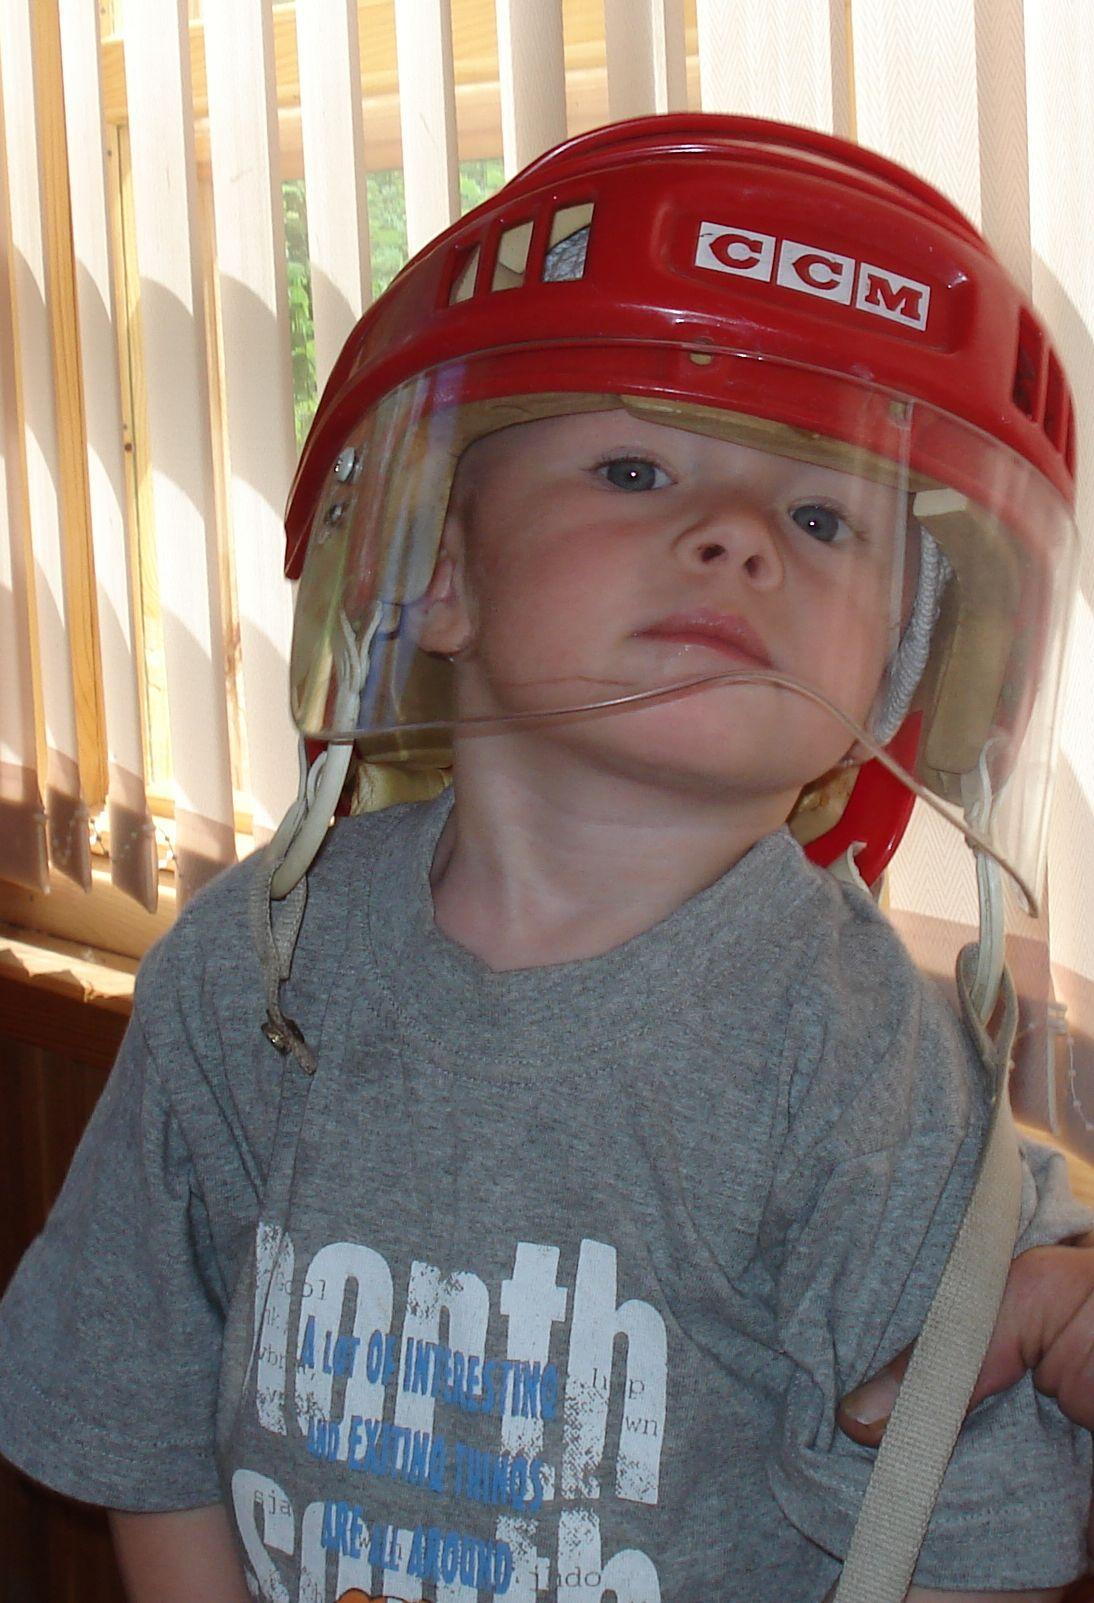 Примерю-ка папин шлем!. Малыши